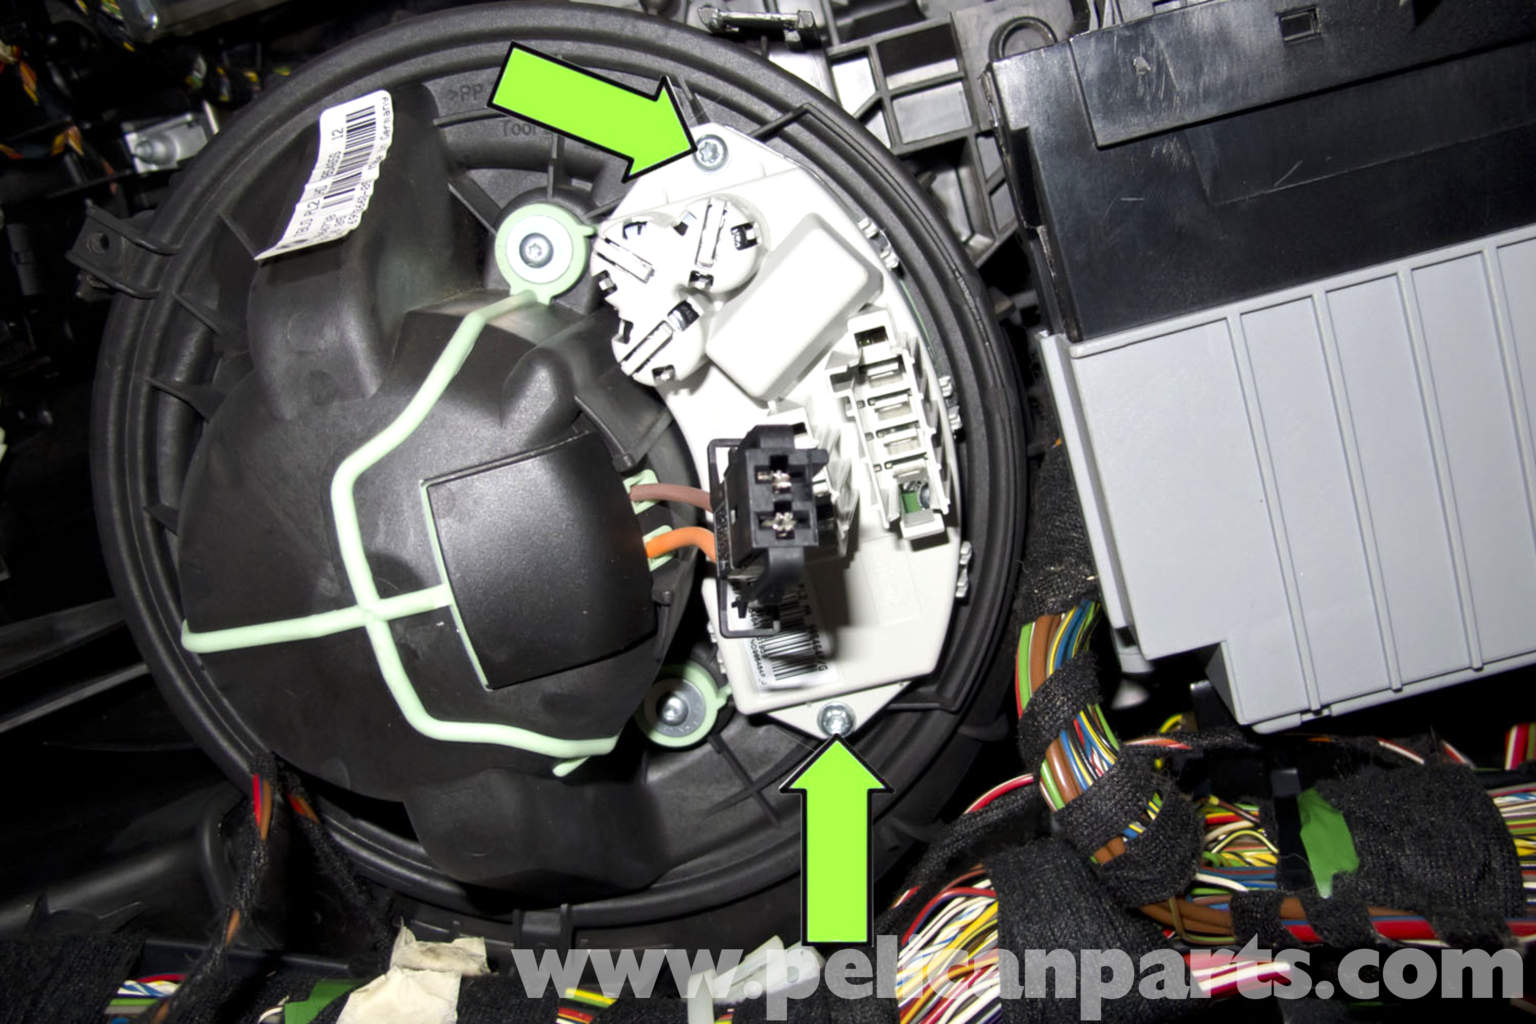 ac motor speed controller circuit diagram tekonsha 7894 wiring bmw e90 blower replacement | e91, e92, e93 pelican parts diy maintenance article